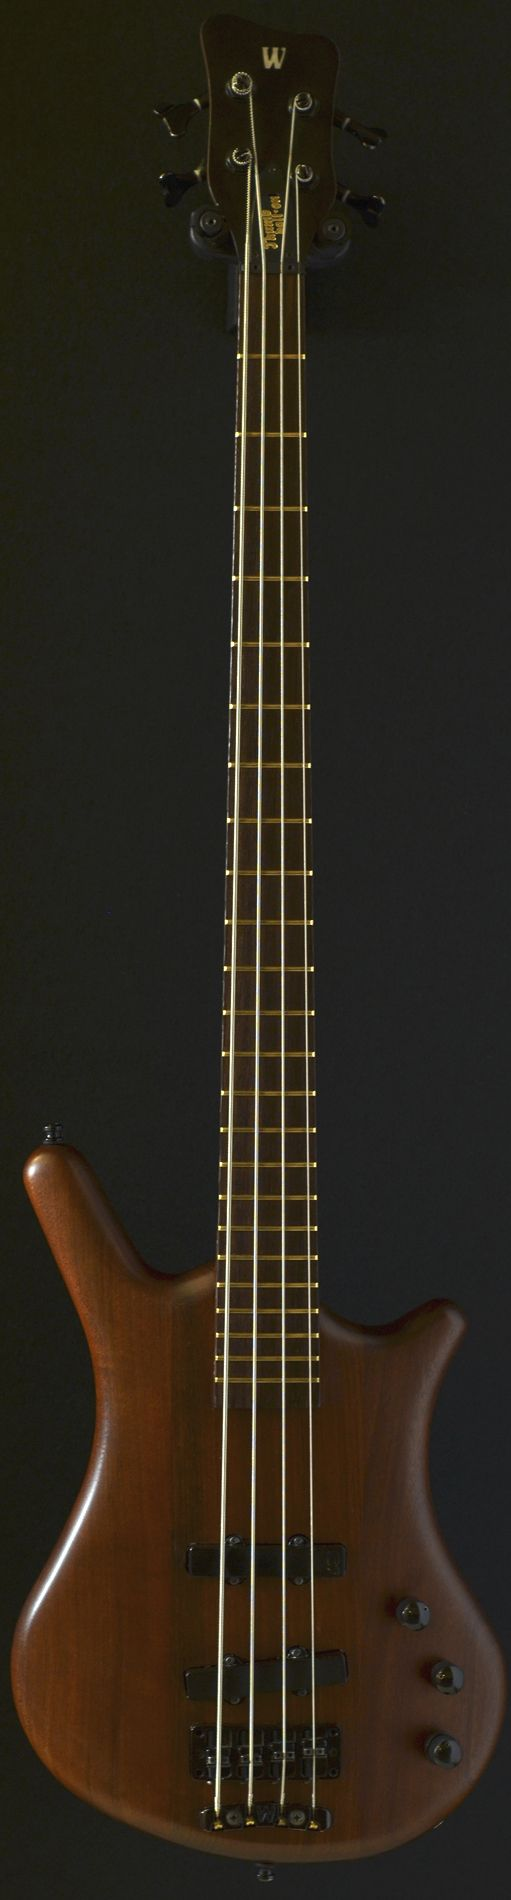 Warwick Thumb BO 4 string bass (2002)